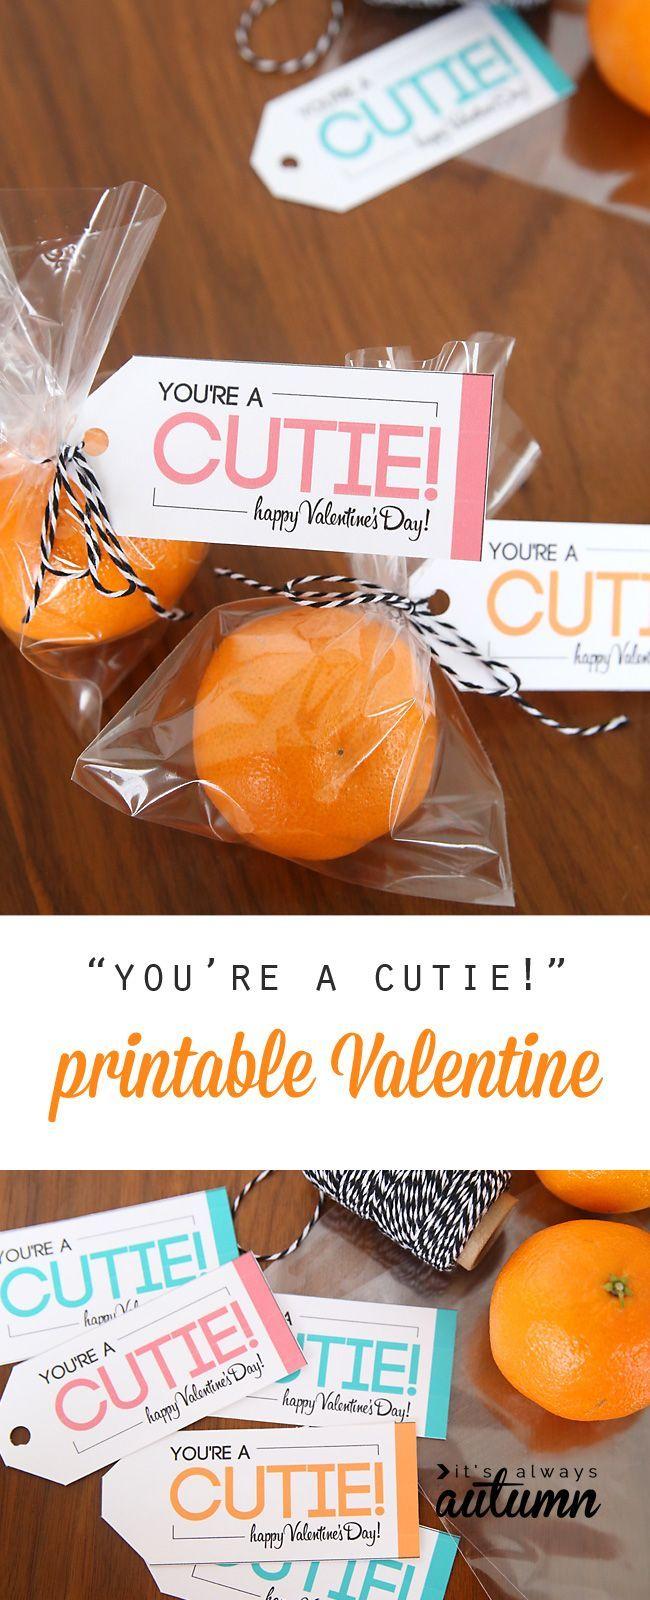 567 best i ♥ Valentine's day images on Pinterest | Valentine ...